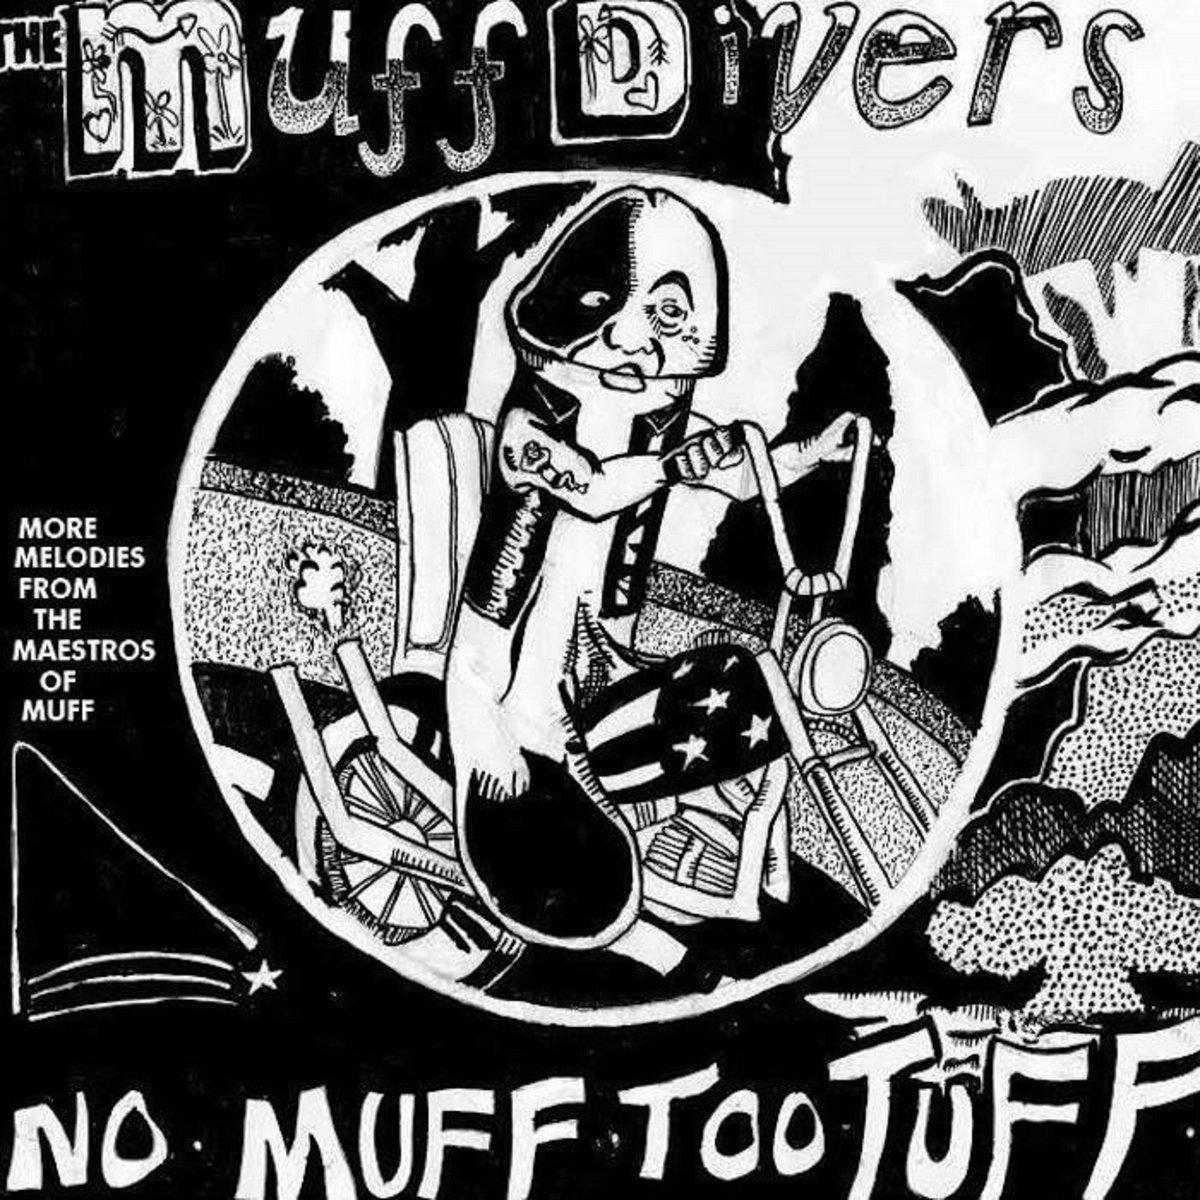 Black muff divers